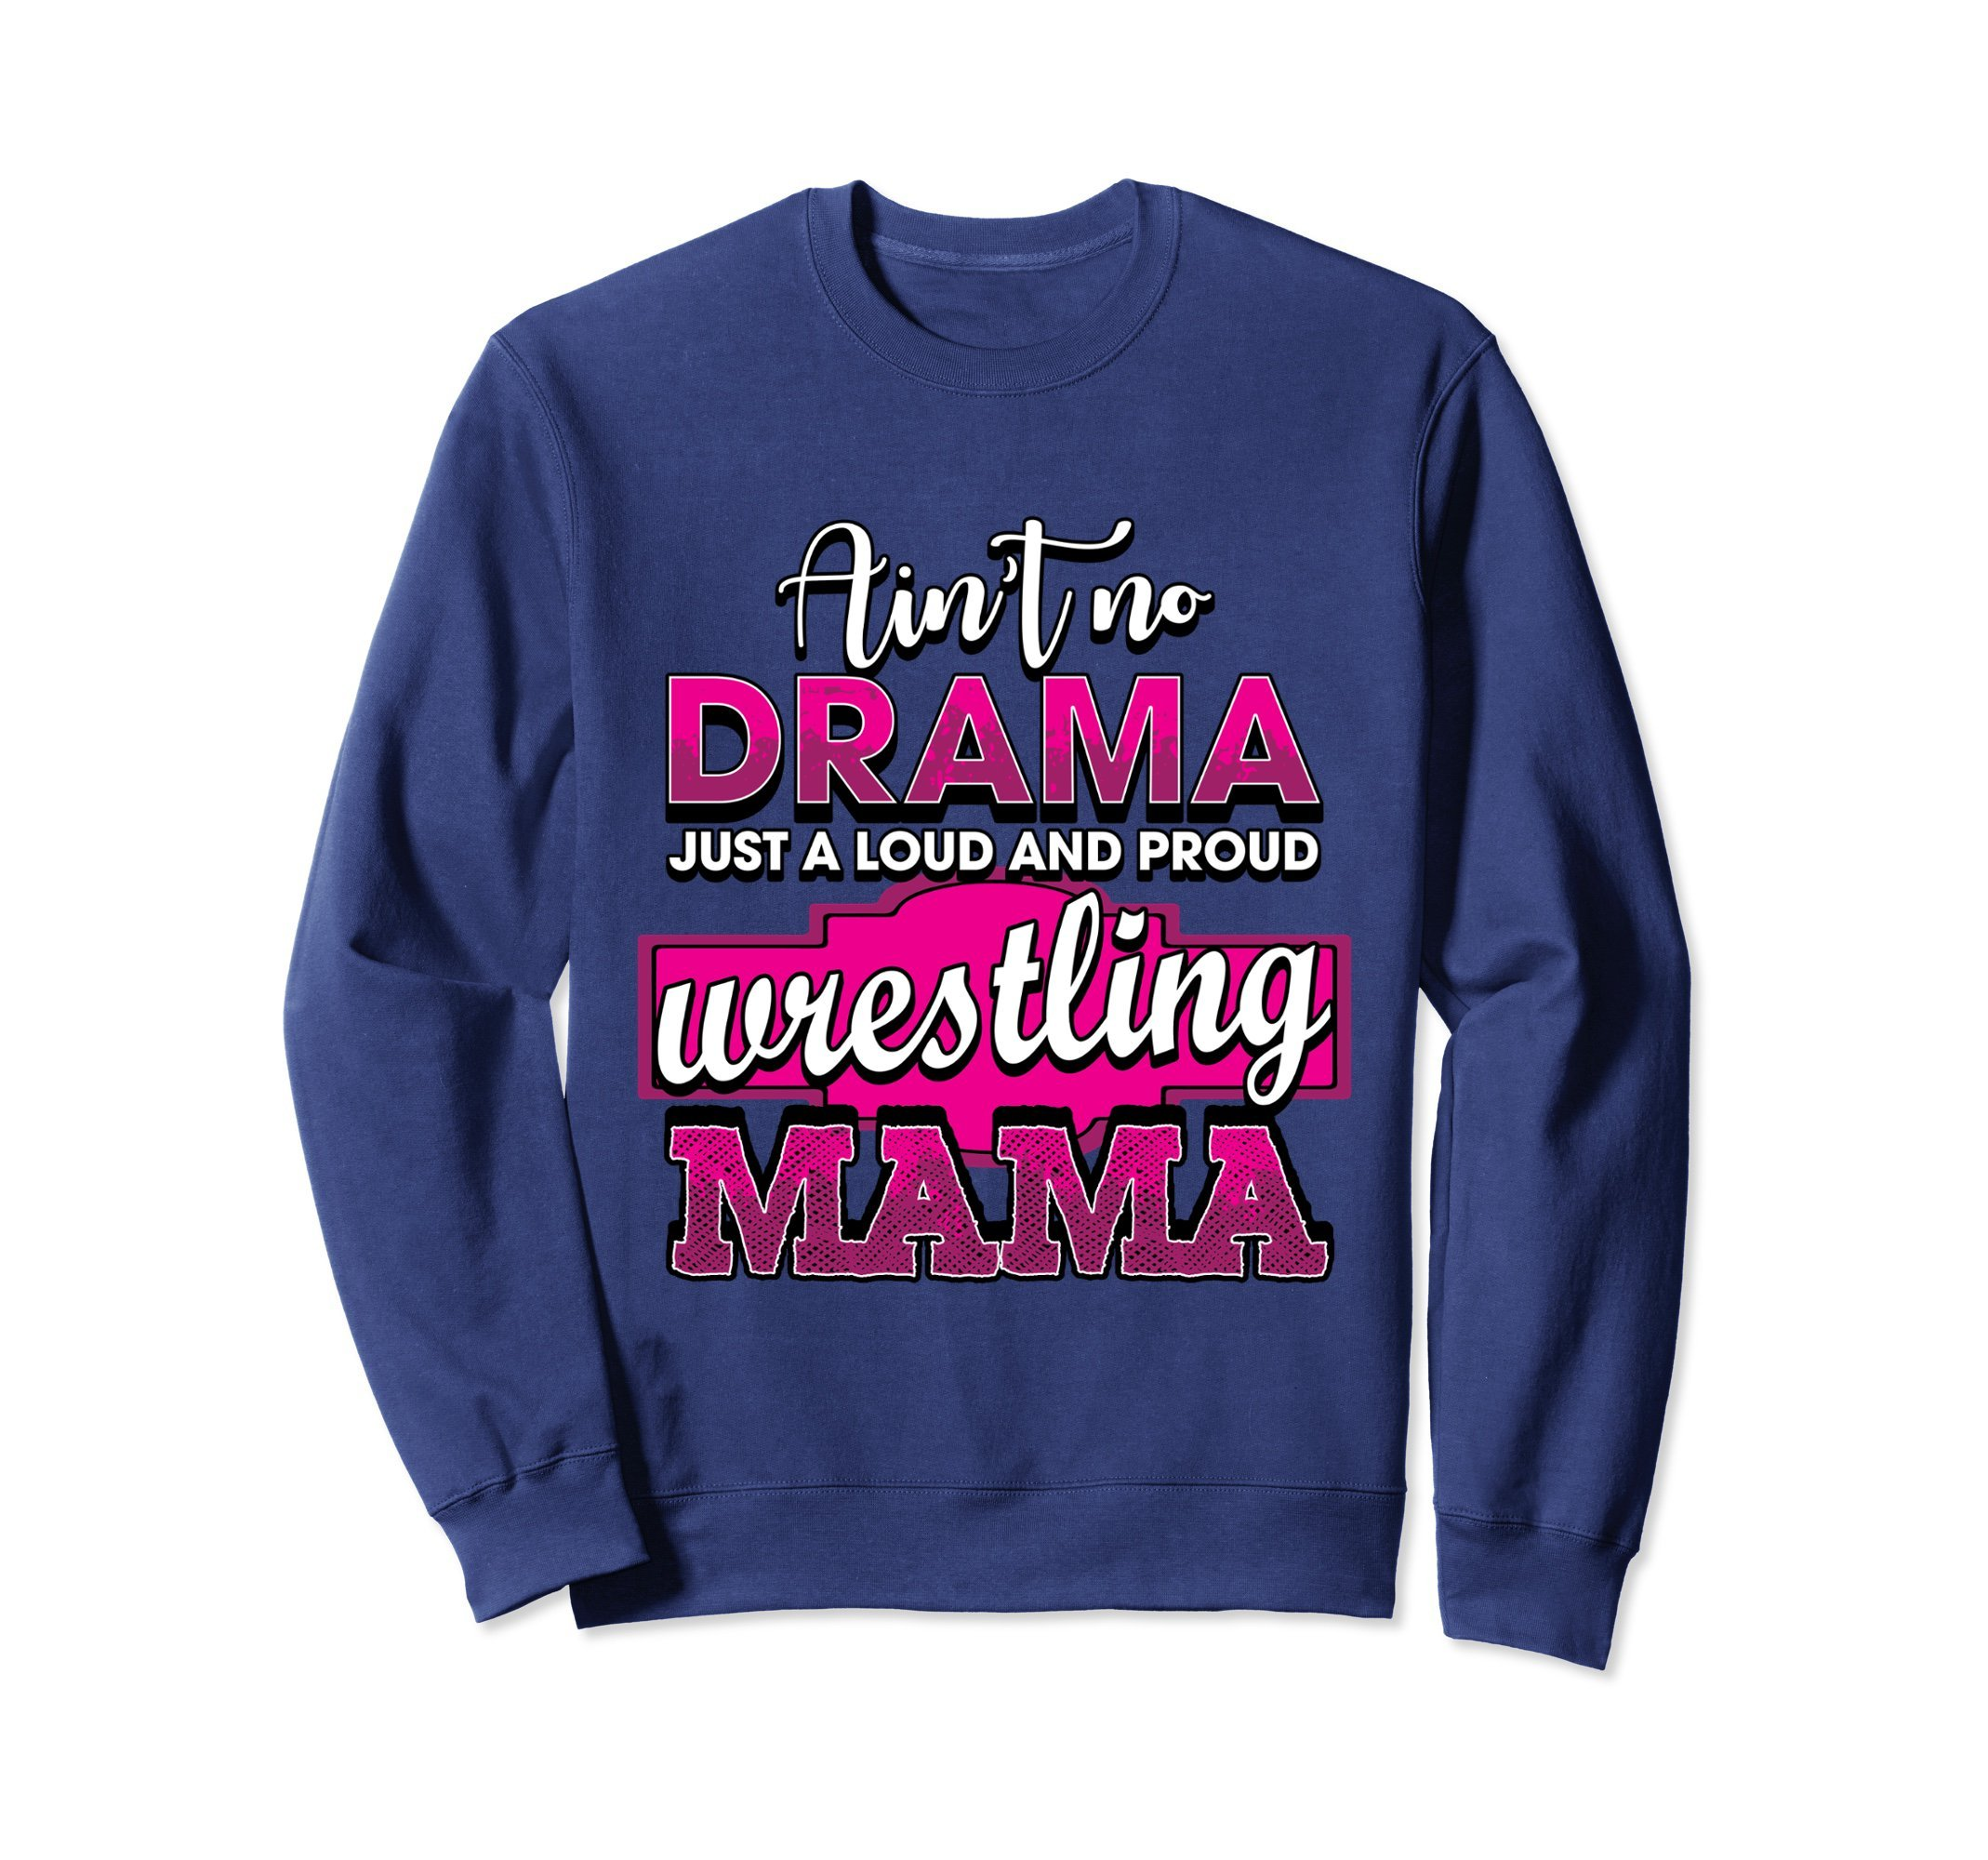 Unisex Wrestling Sweatshirt - Ain't No Drama Wrestling Mama Sweater 2XL Navy